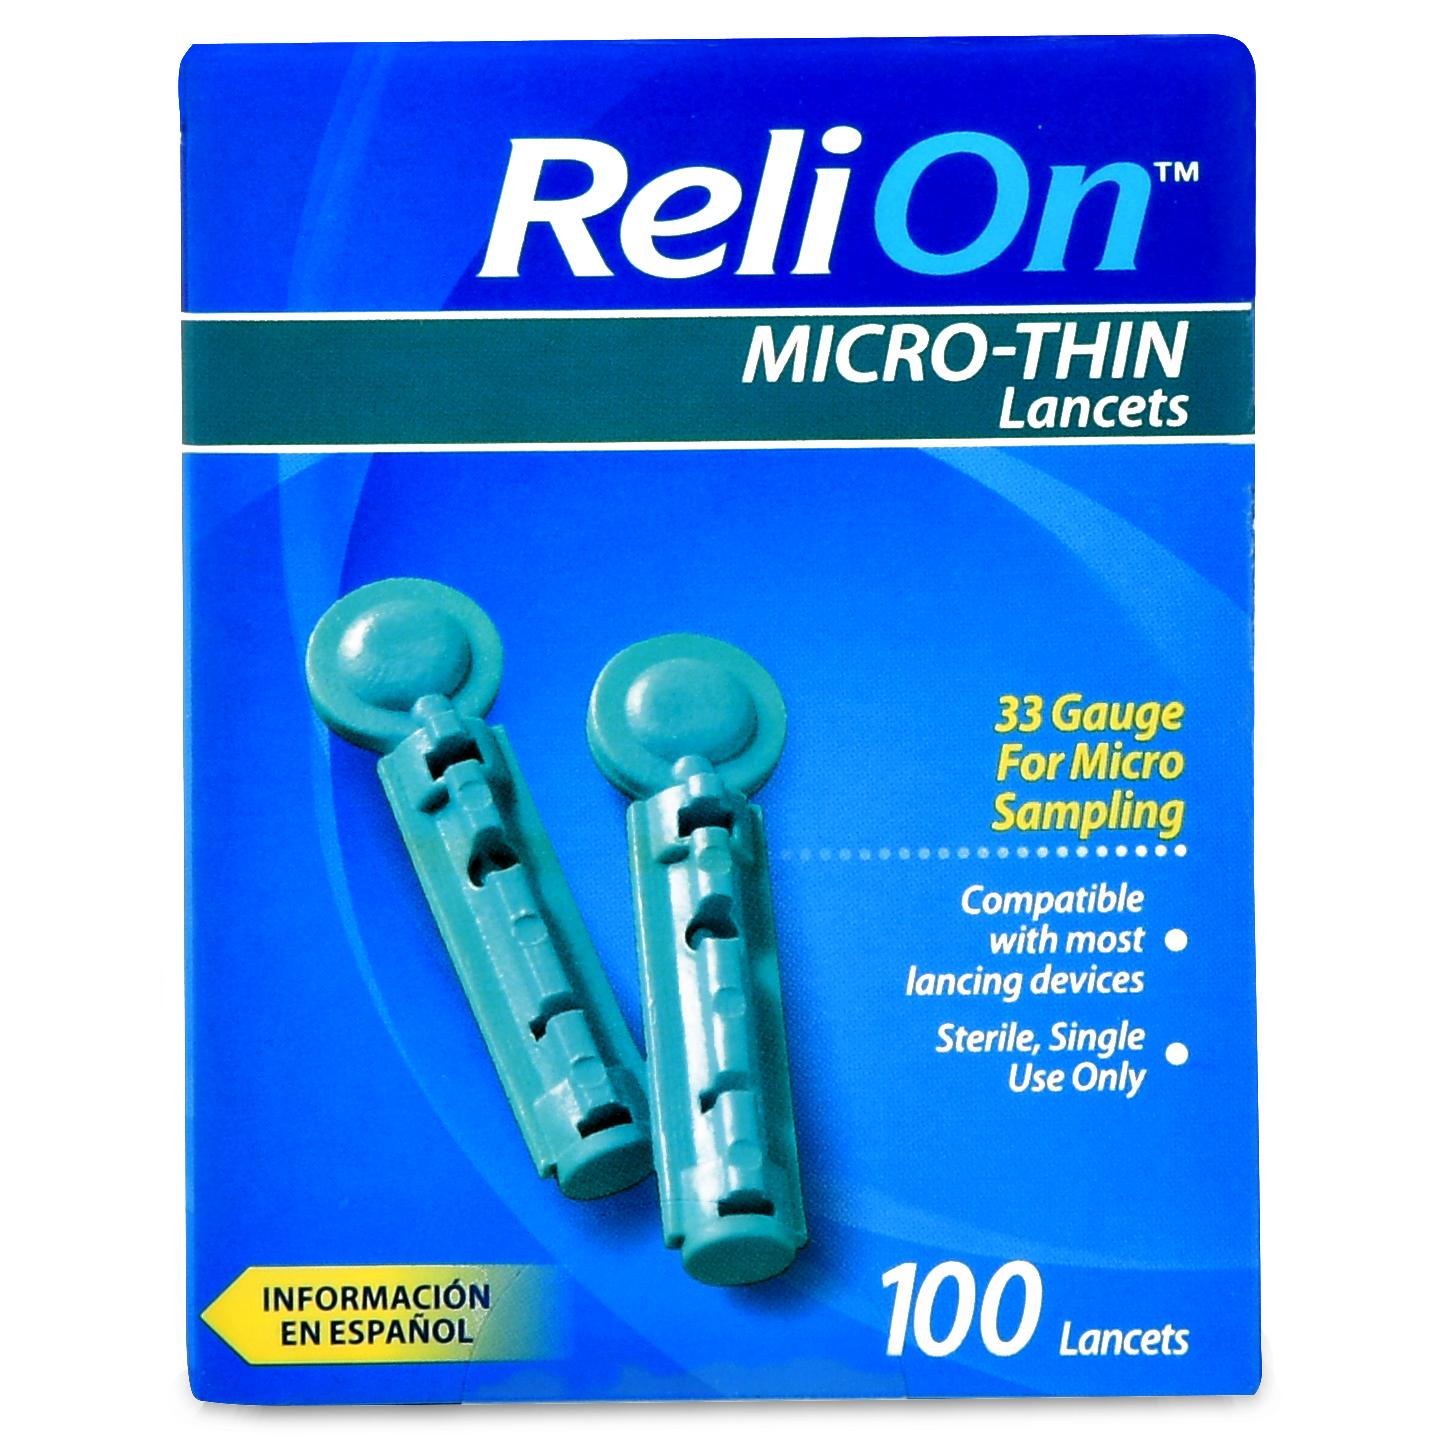 ReliOn 33 Gauge Micro-Thin Lancets, 100 Ct